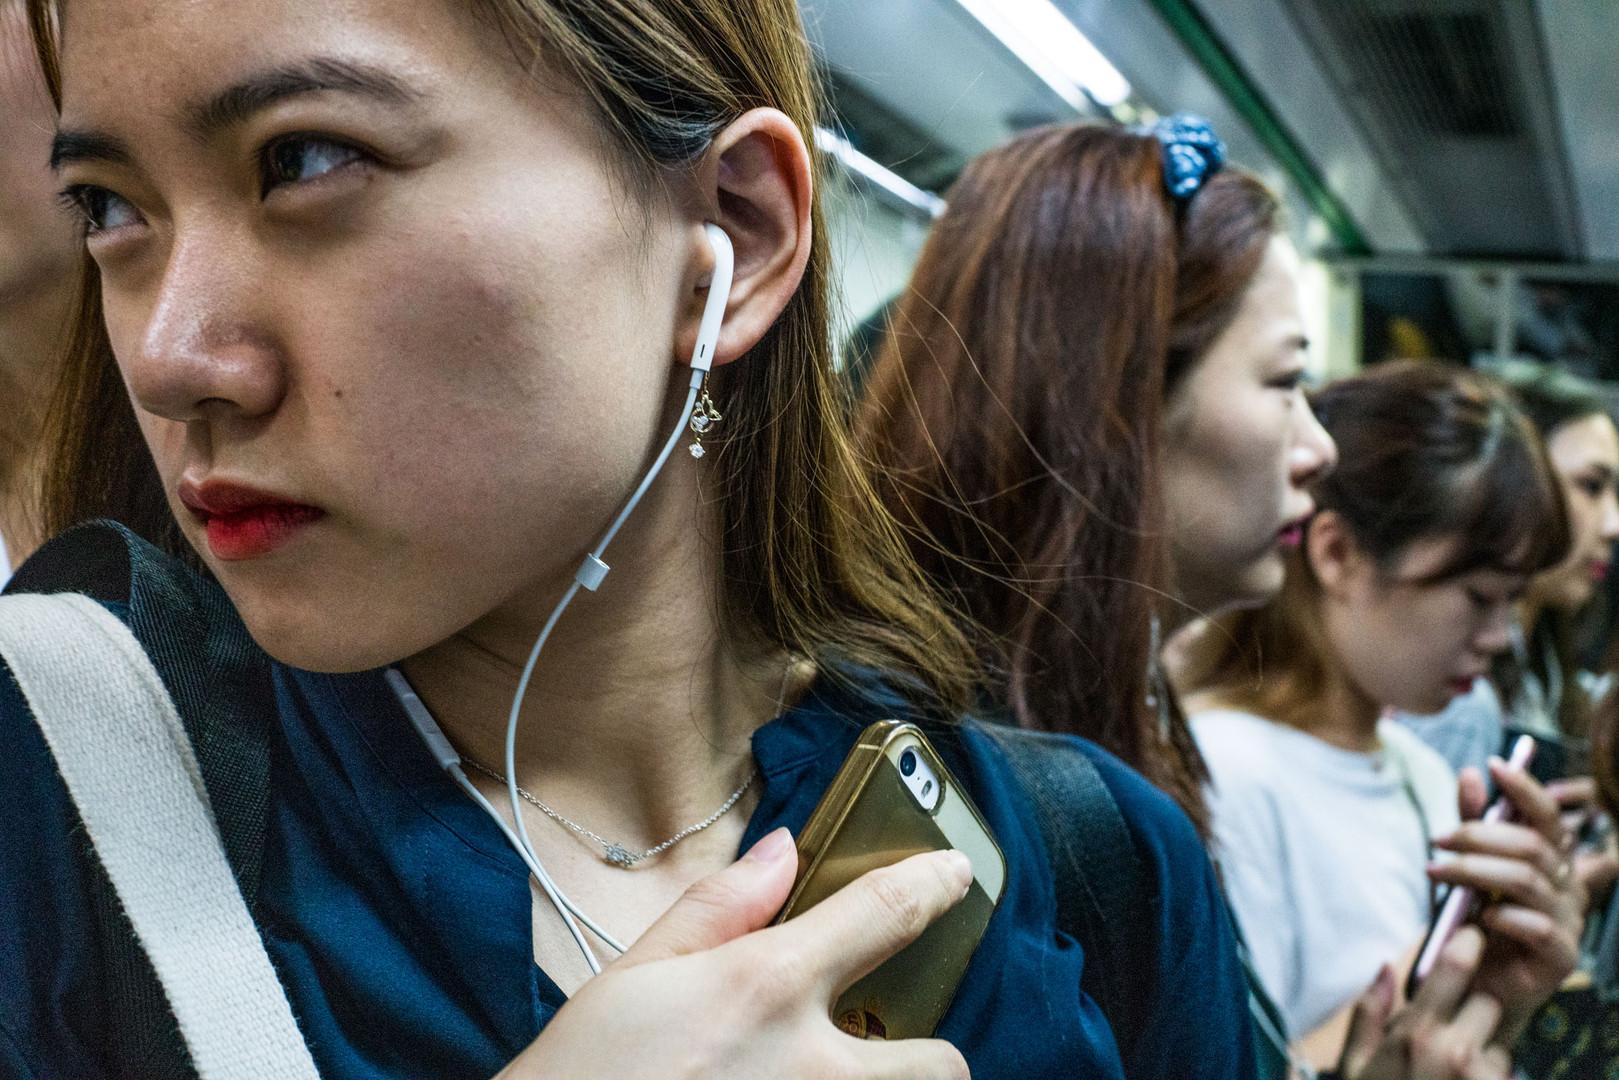 Seoul's Crowded Subways